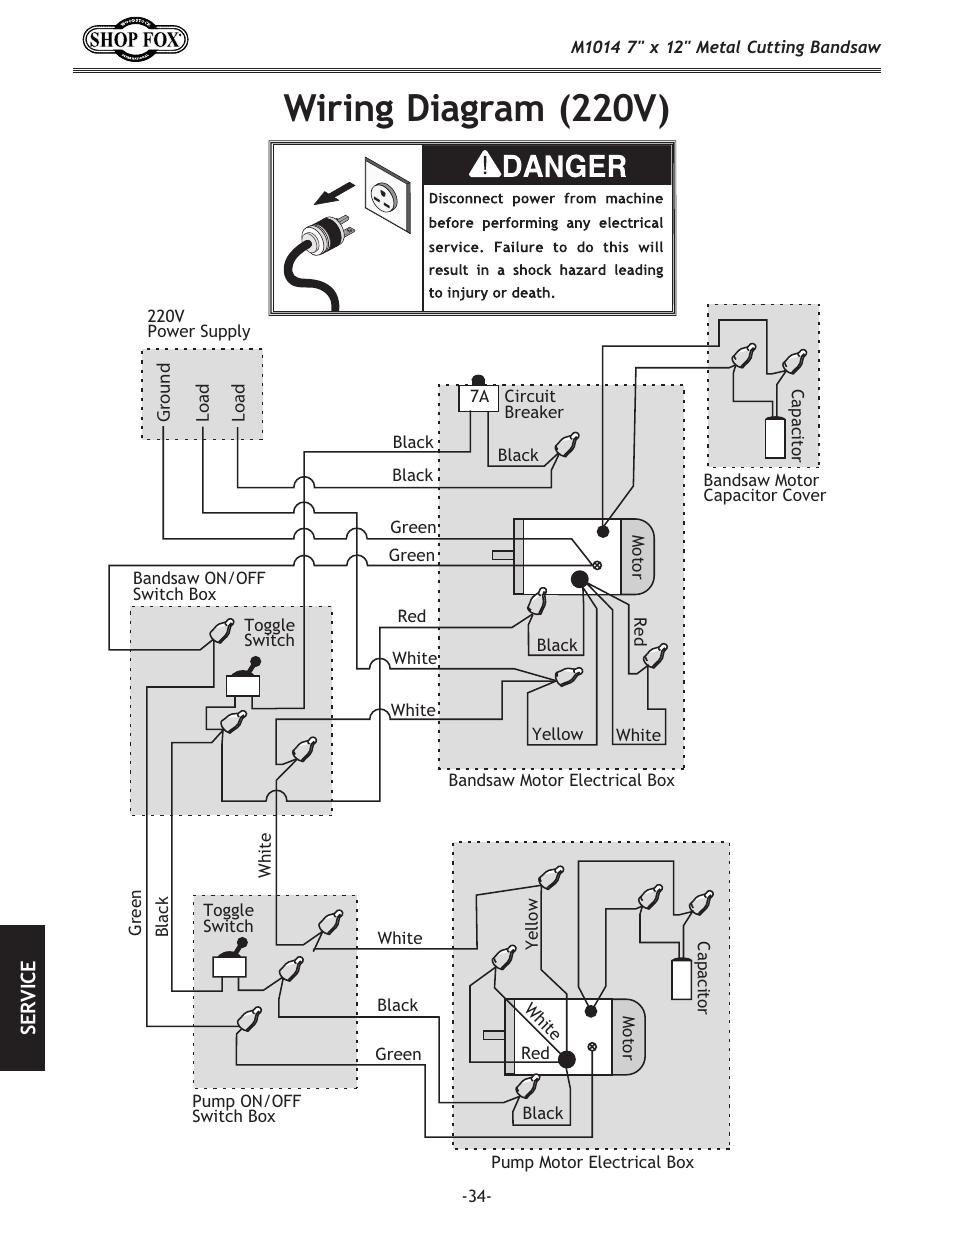 Wiring Diagram  220v